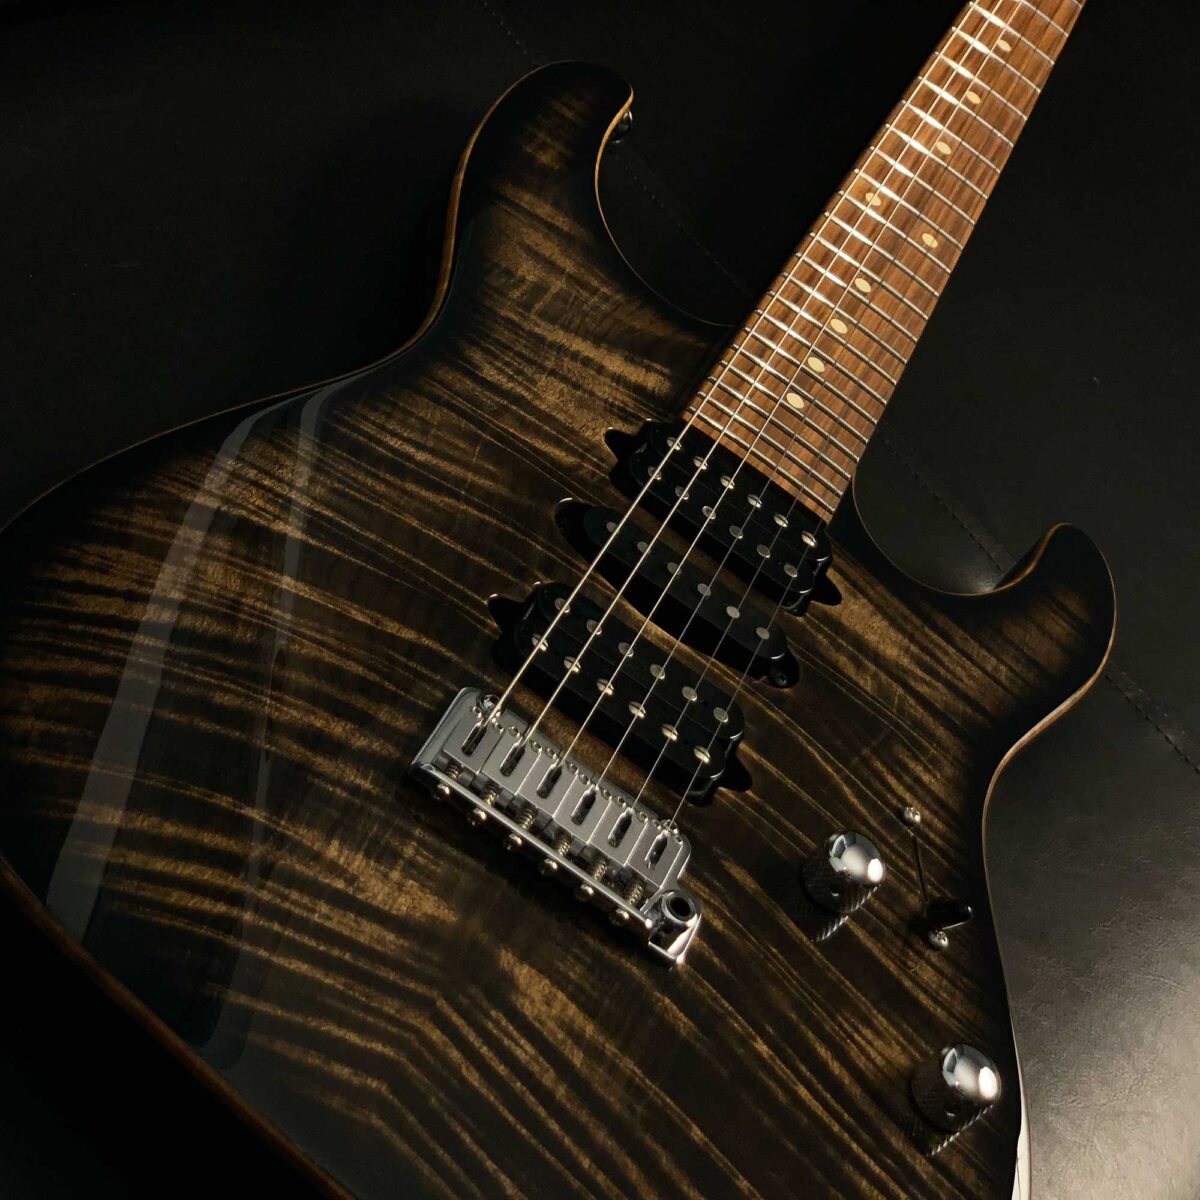 גיטרה חשמלית Suhr Modern Plus, Trans Charcoal Burst